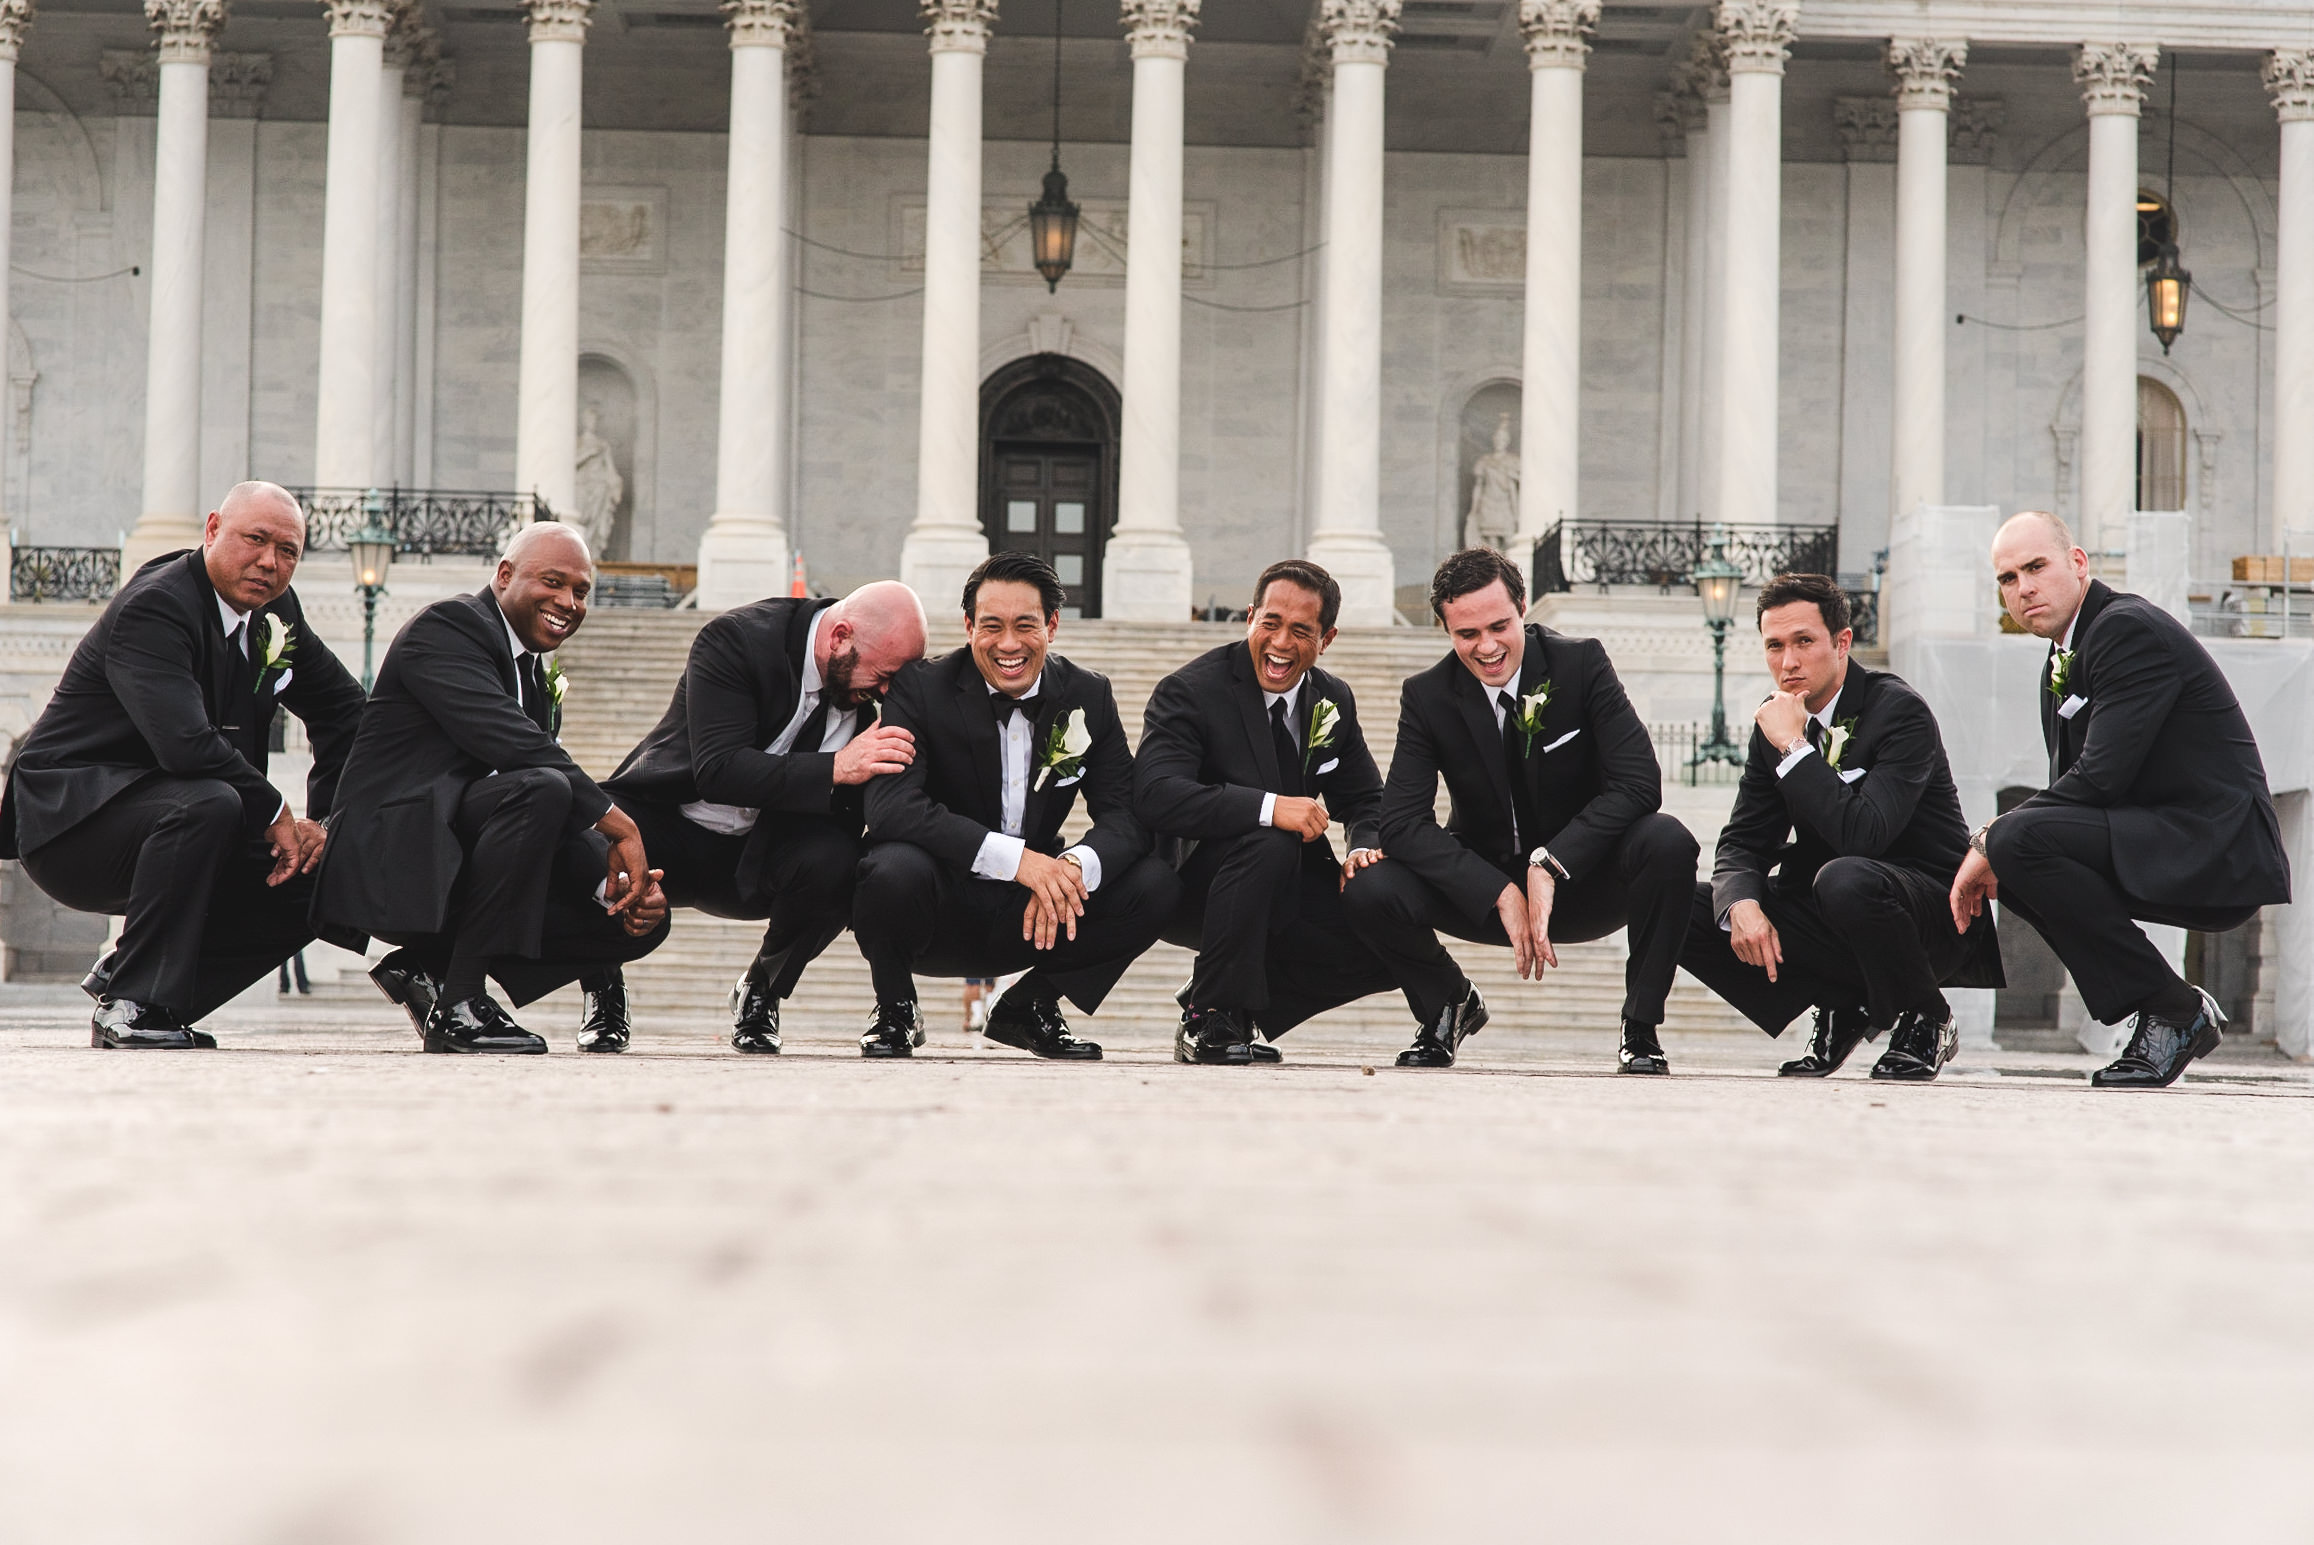 Wedding at W Hotel Washington DC by Mantas Kubilinskas-14.jpg